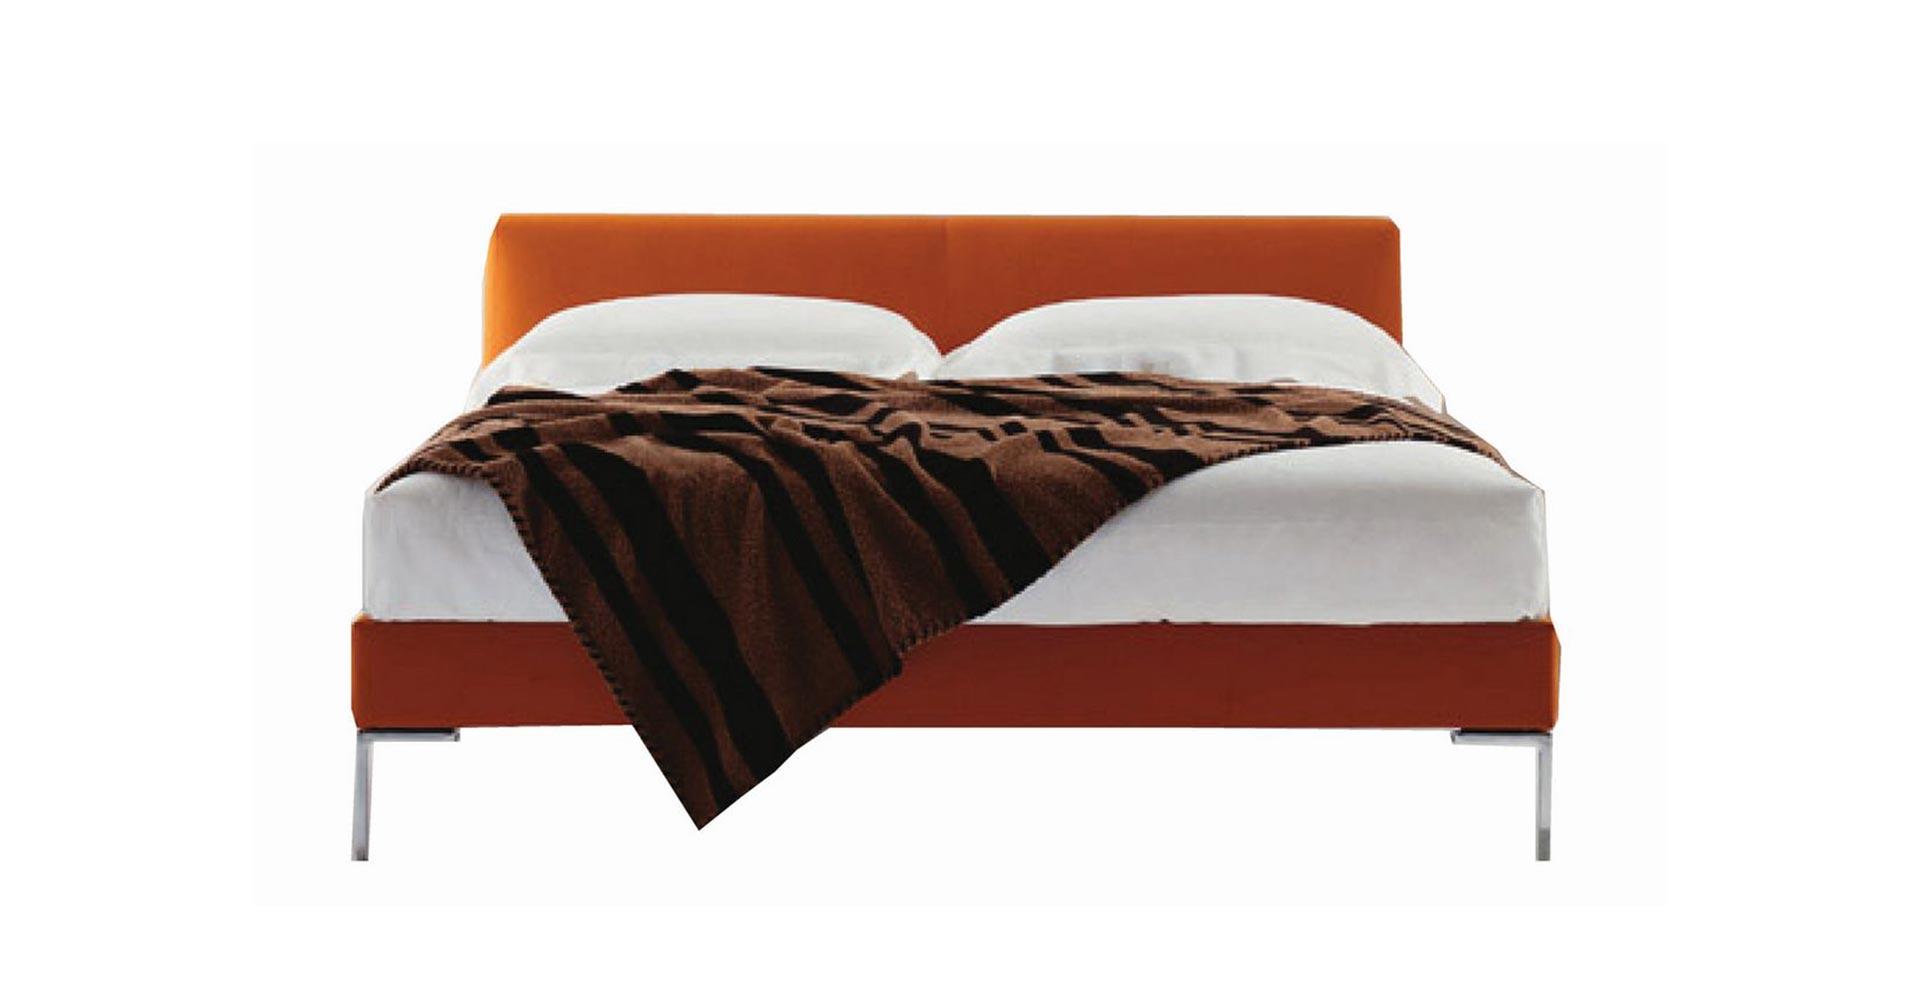 Charles bed b b italia bed canasta b b italia for B b design